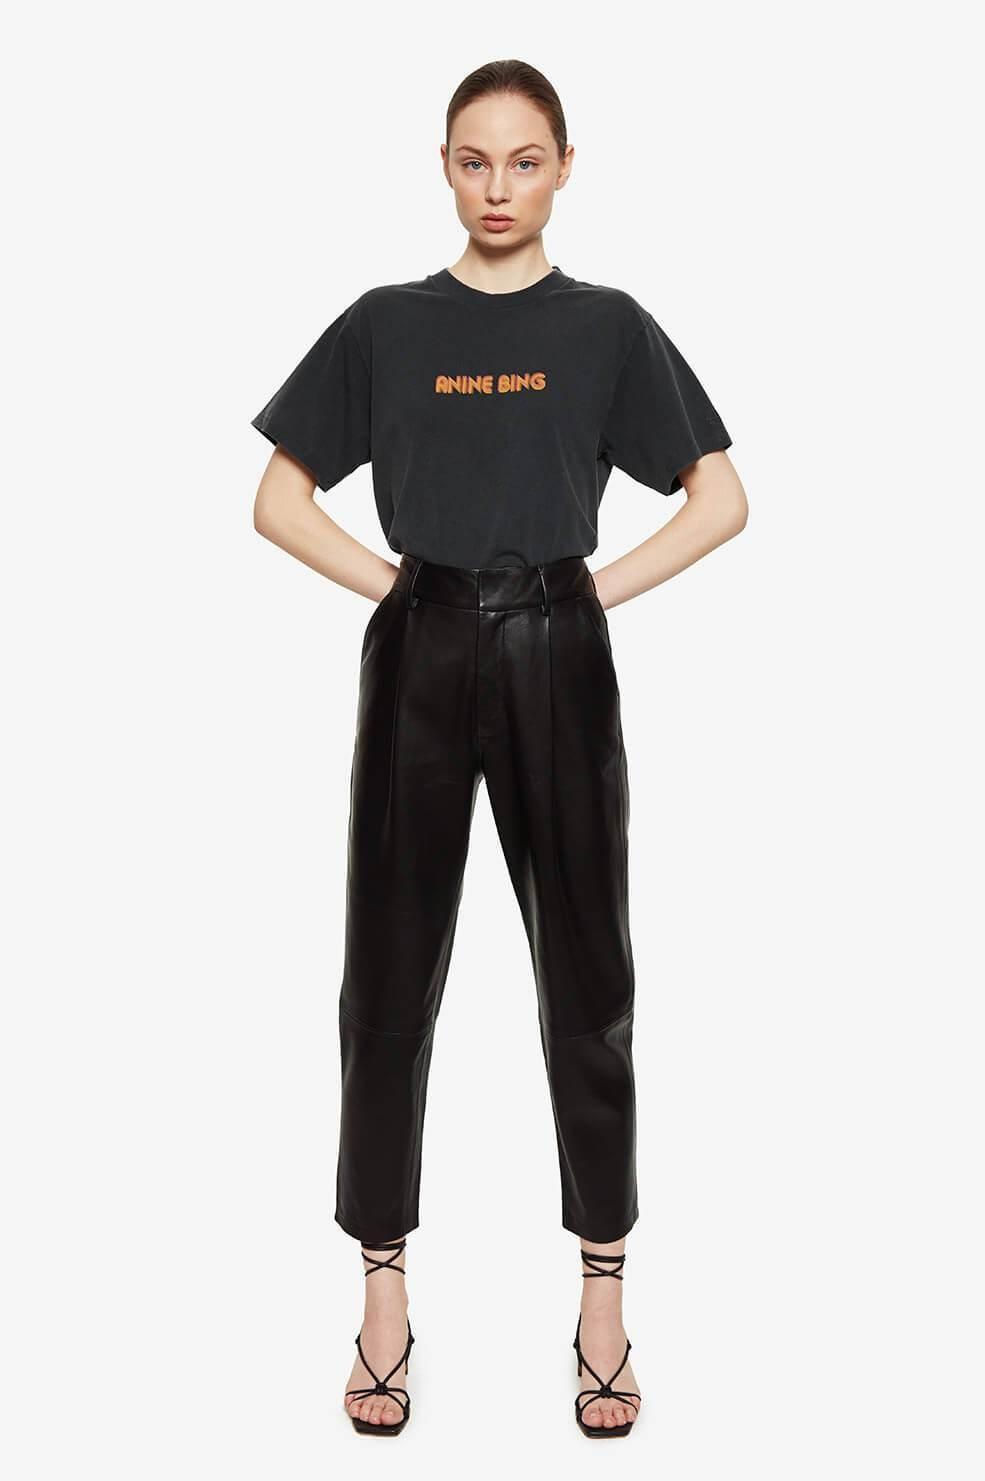 ANINE BING t shirt lili retro-6